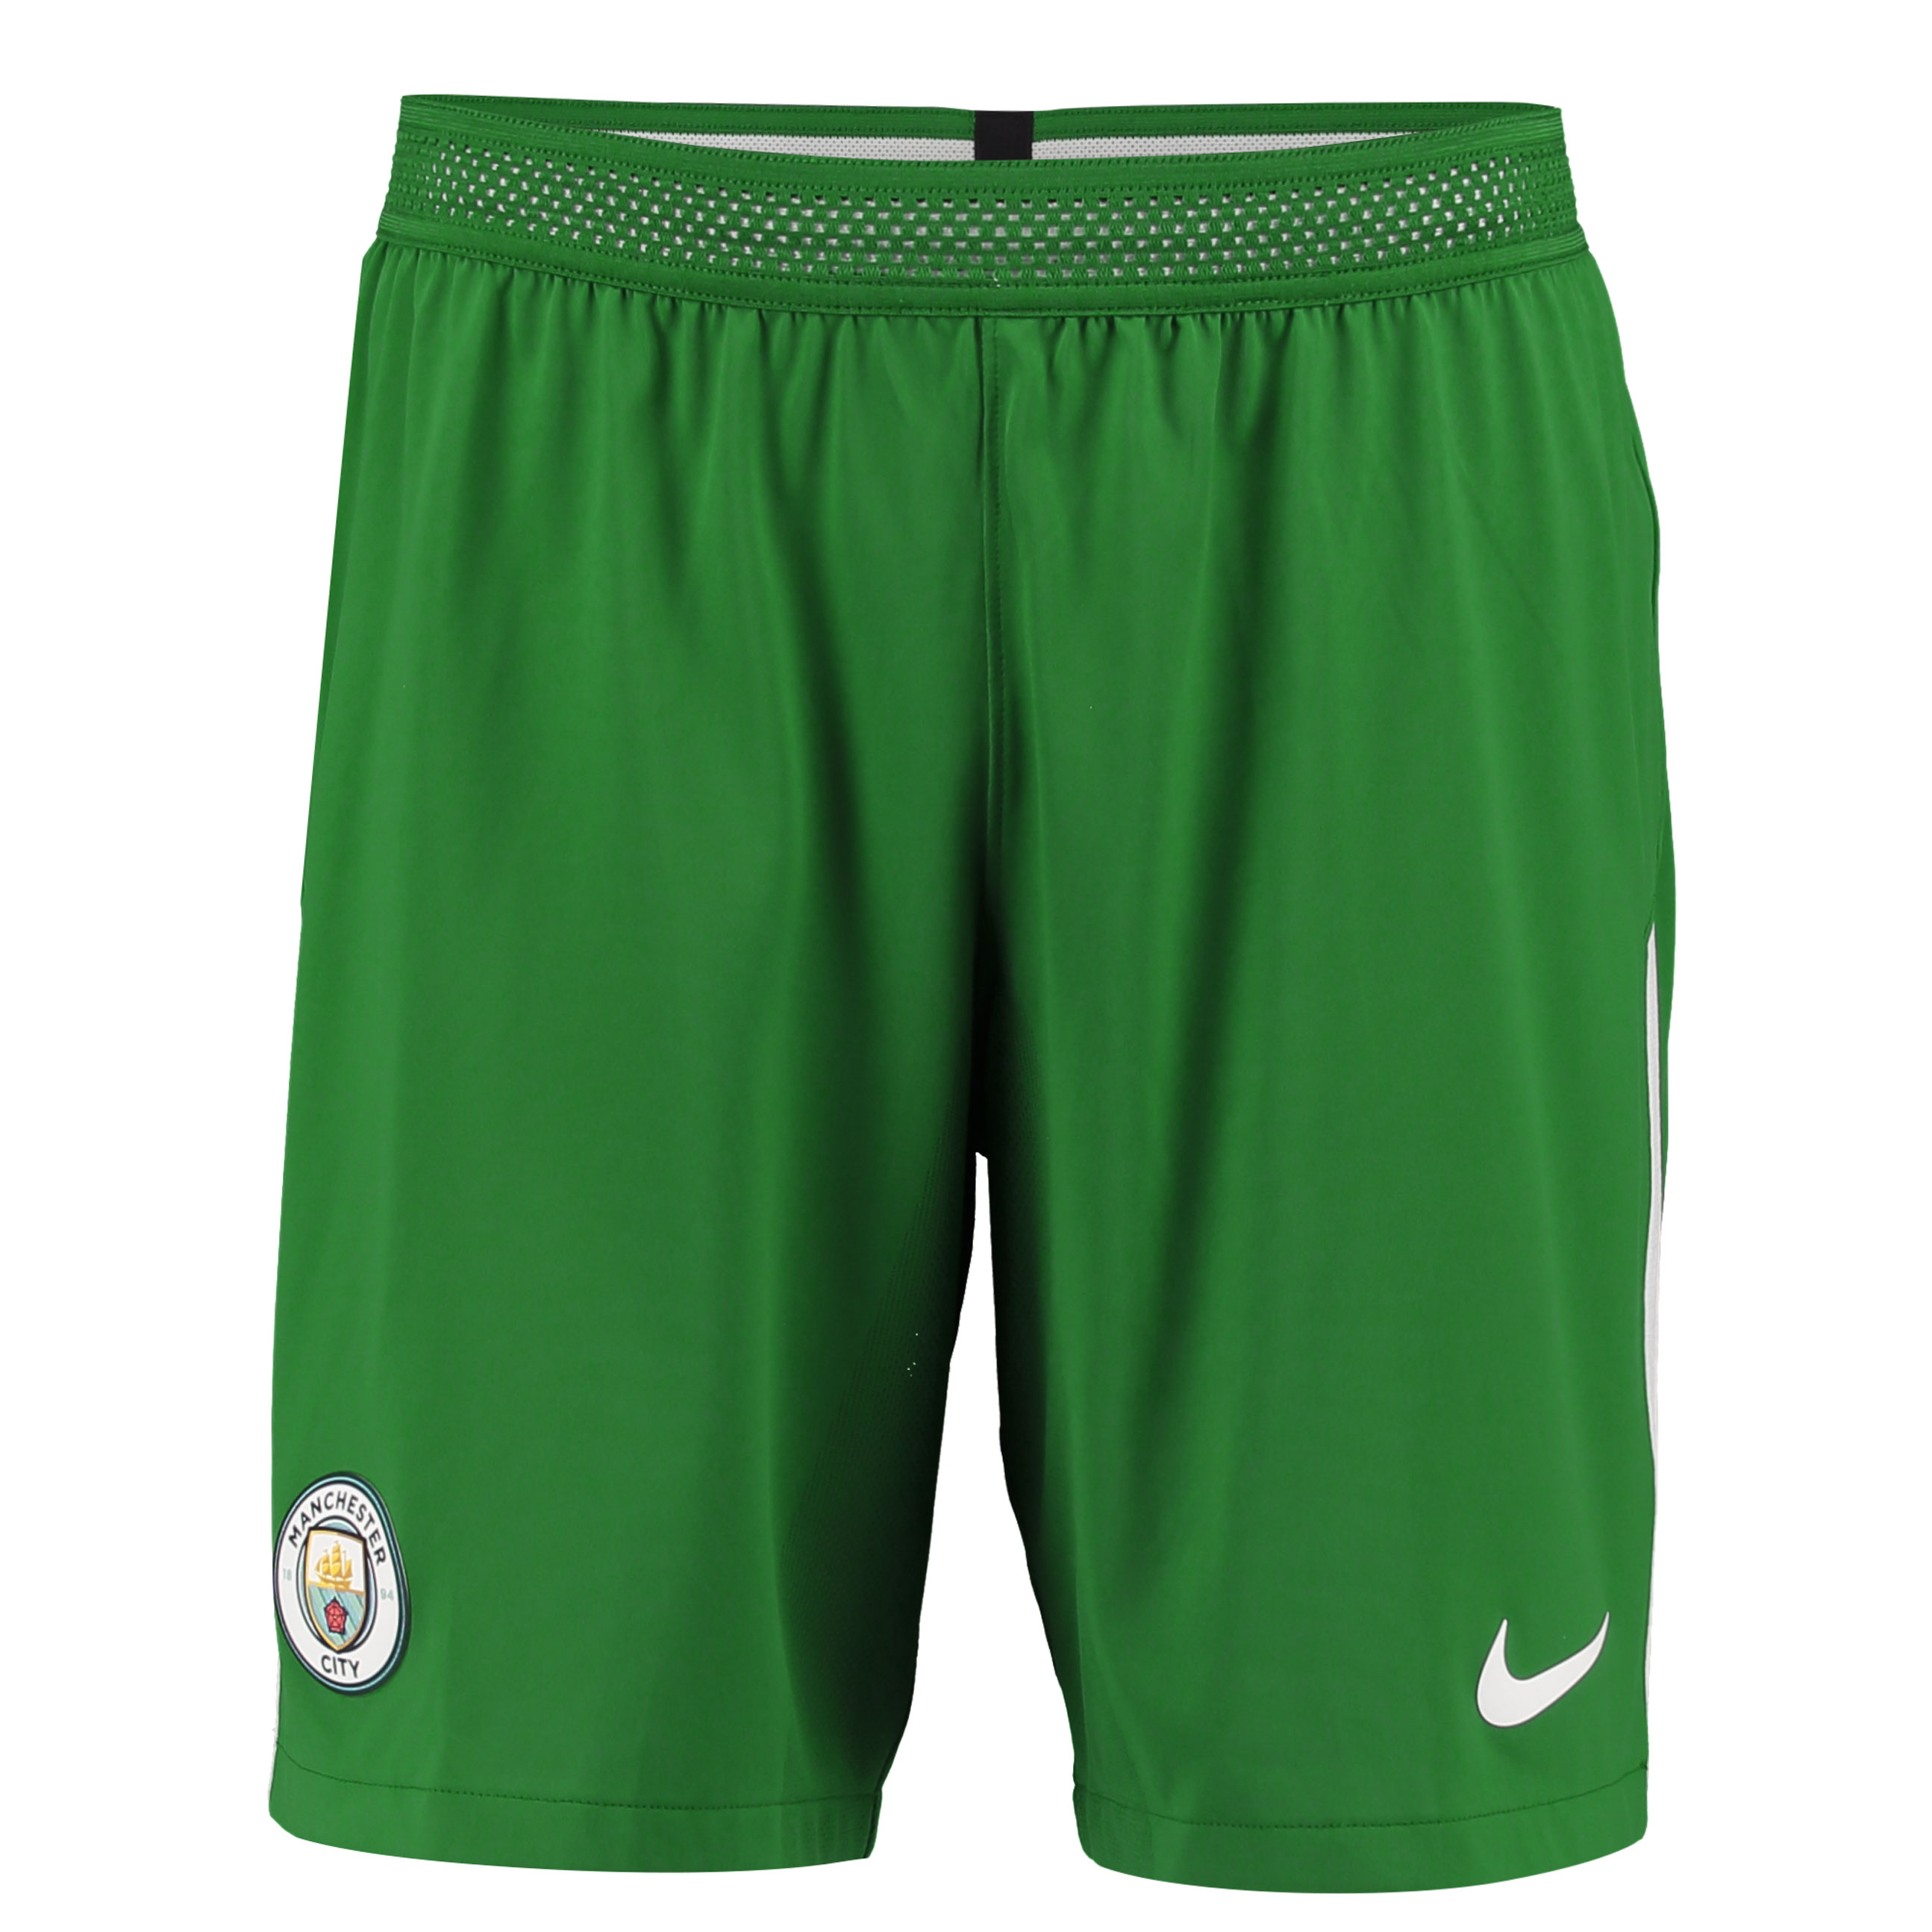 Manchester City Goalkeeper Shorts 2017-18